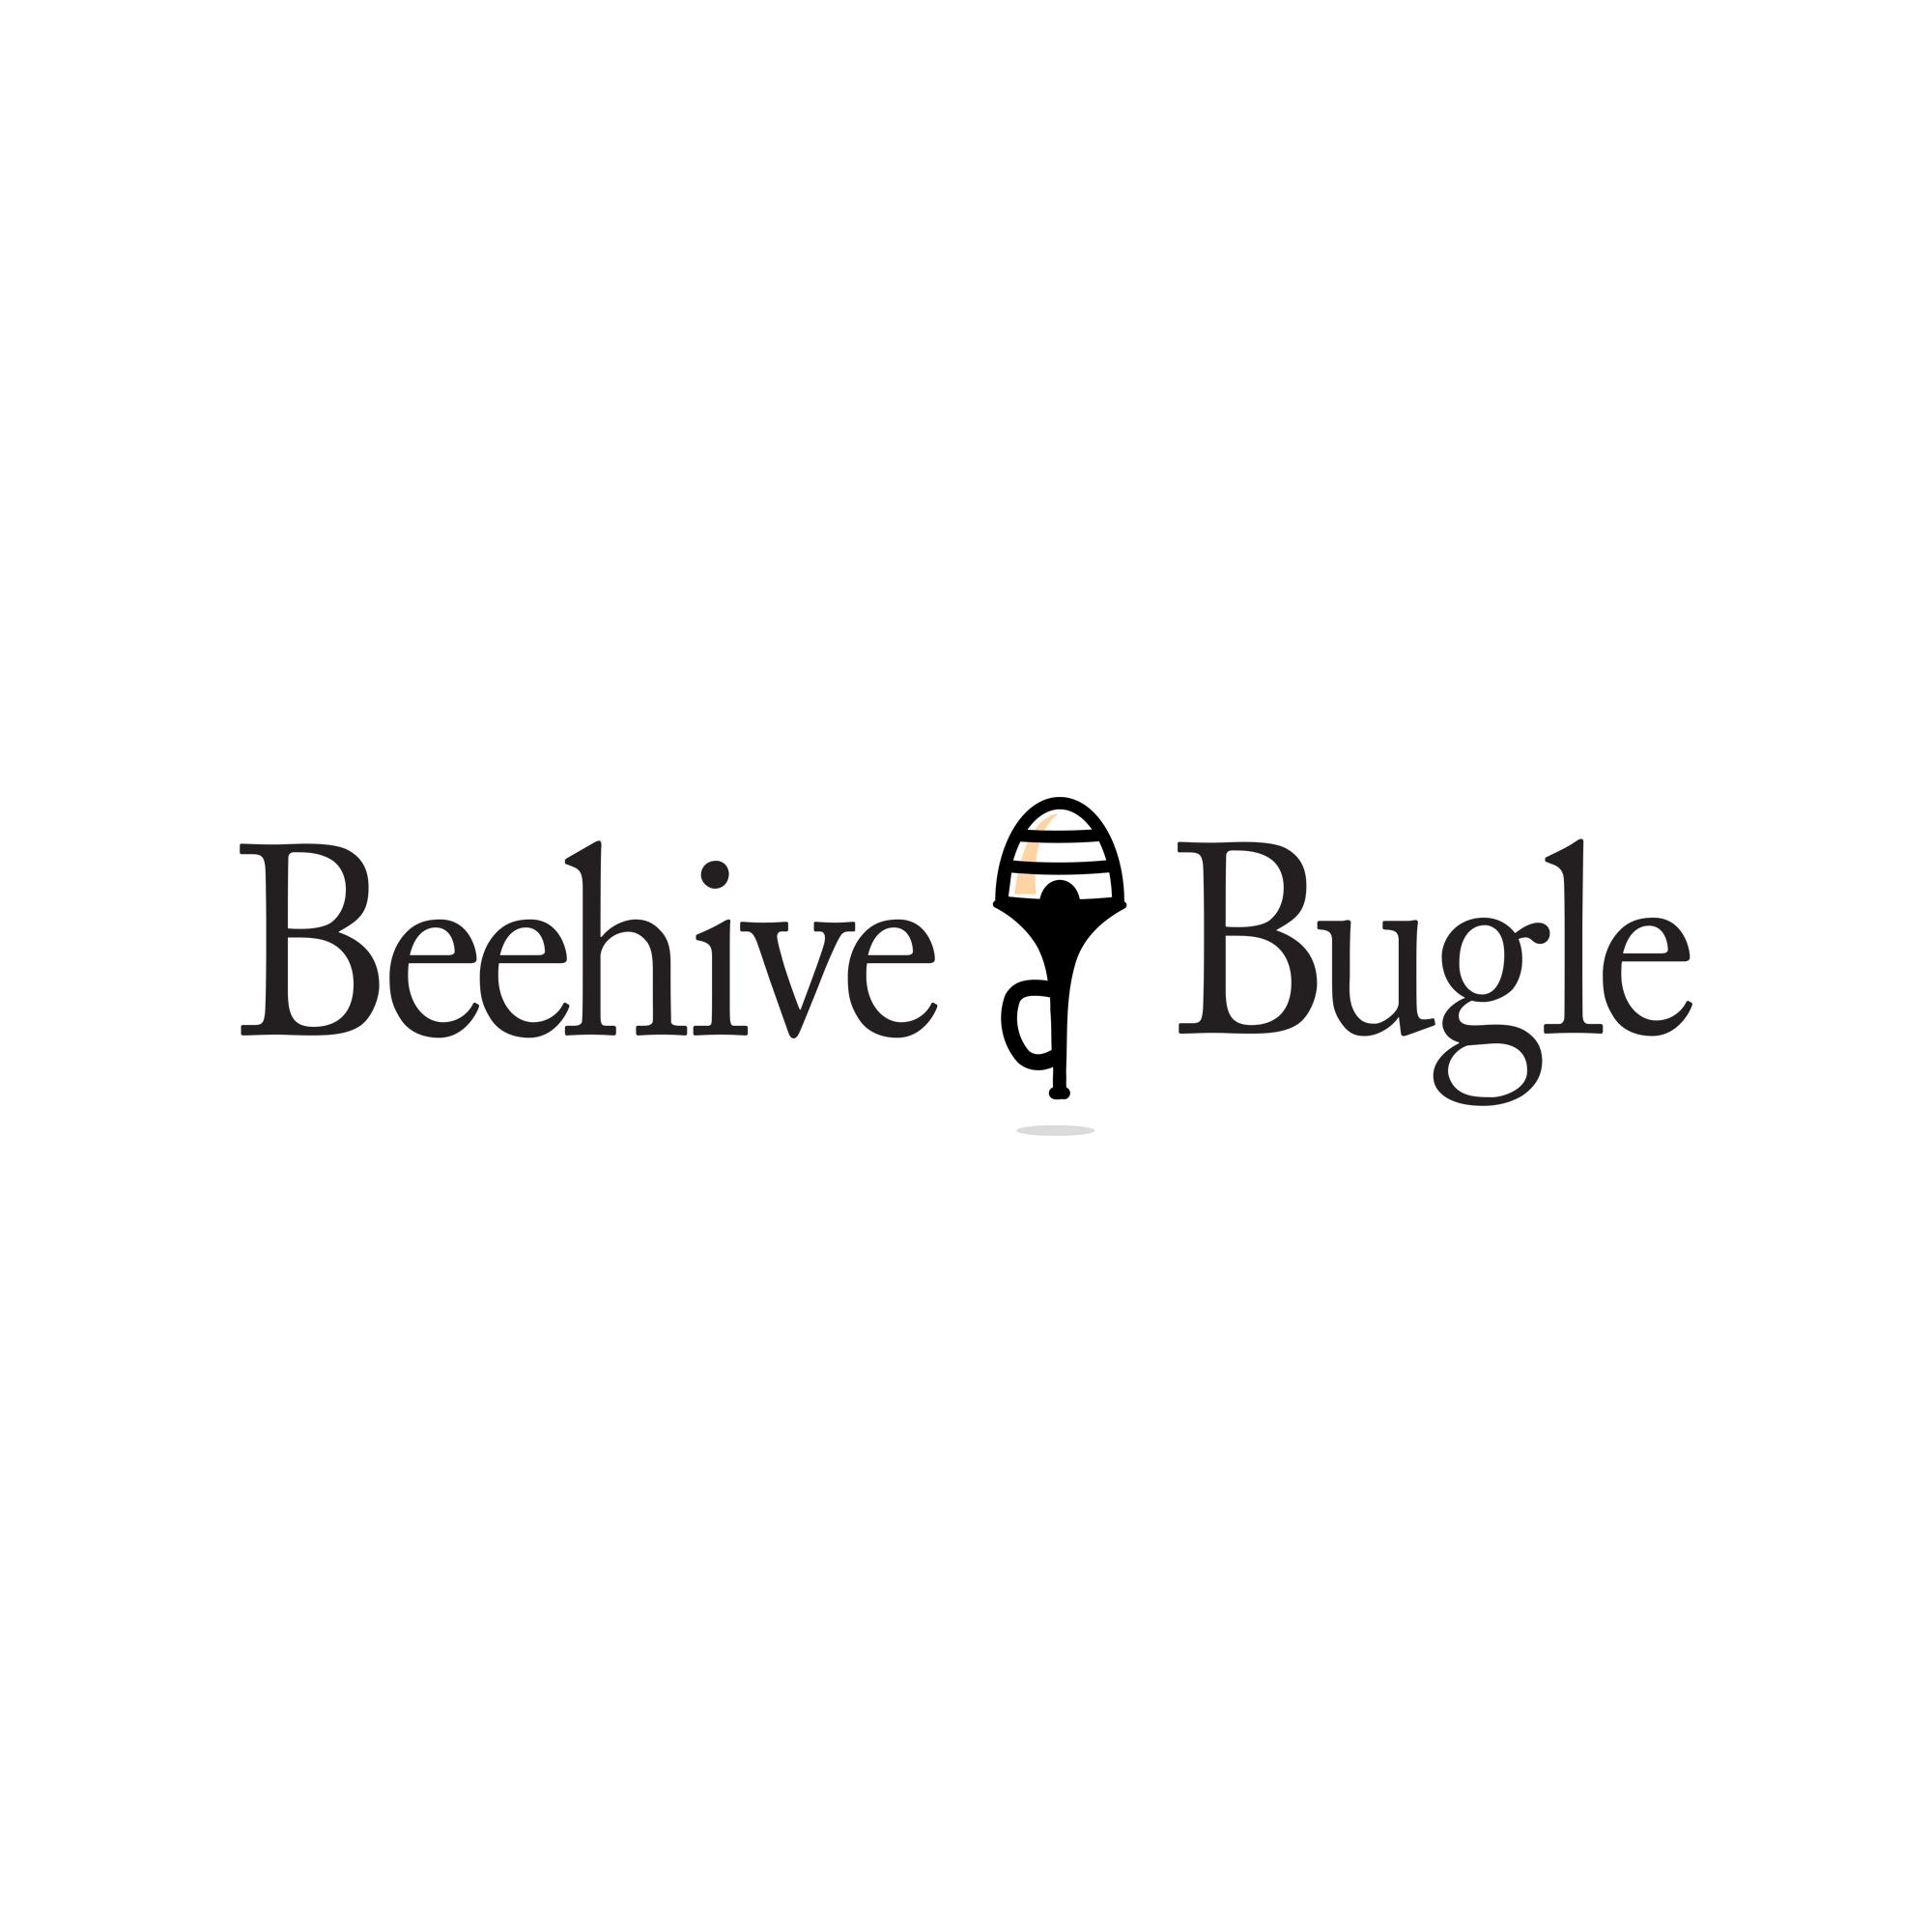 Beehive Bugle